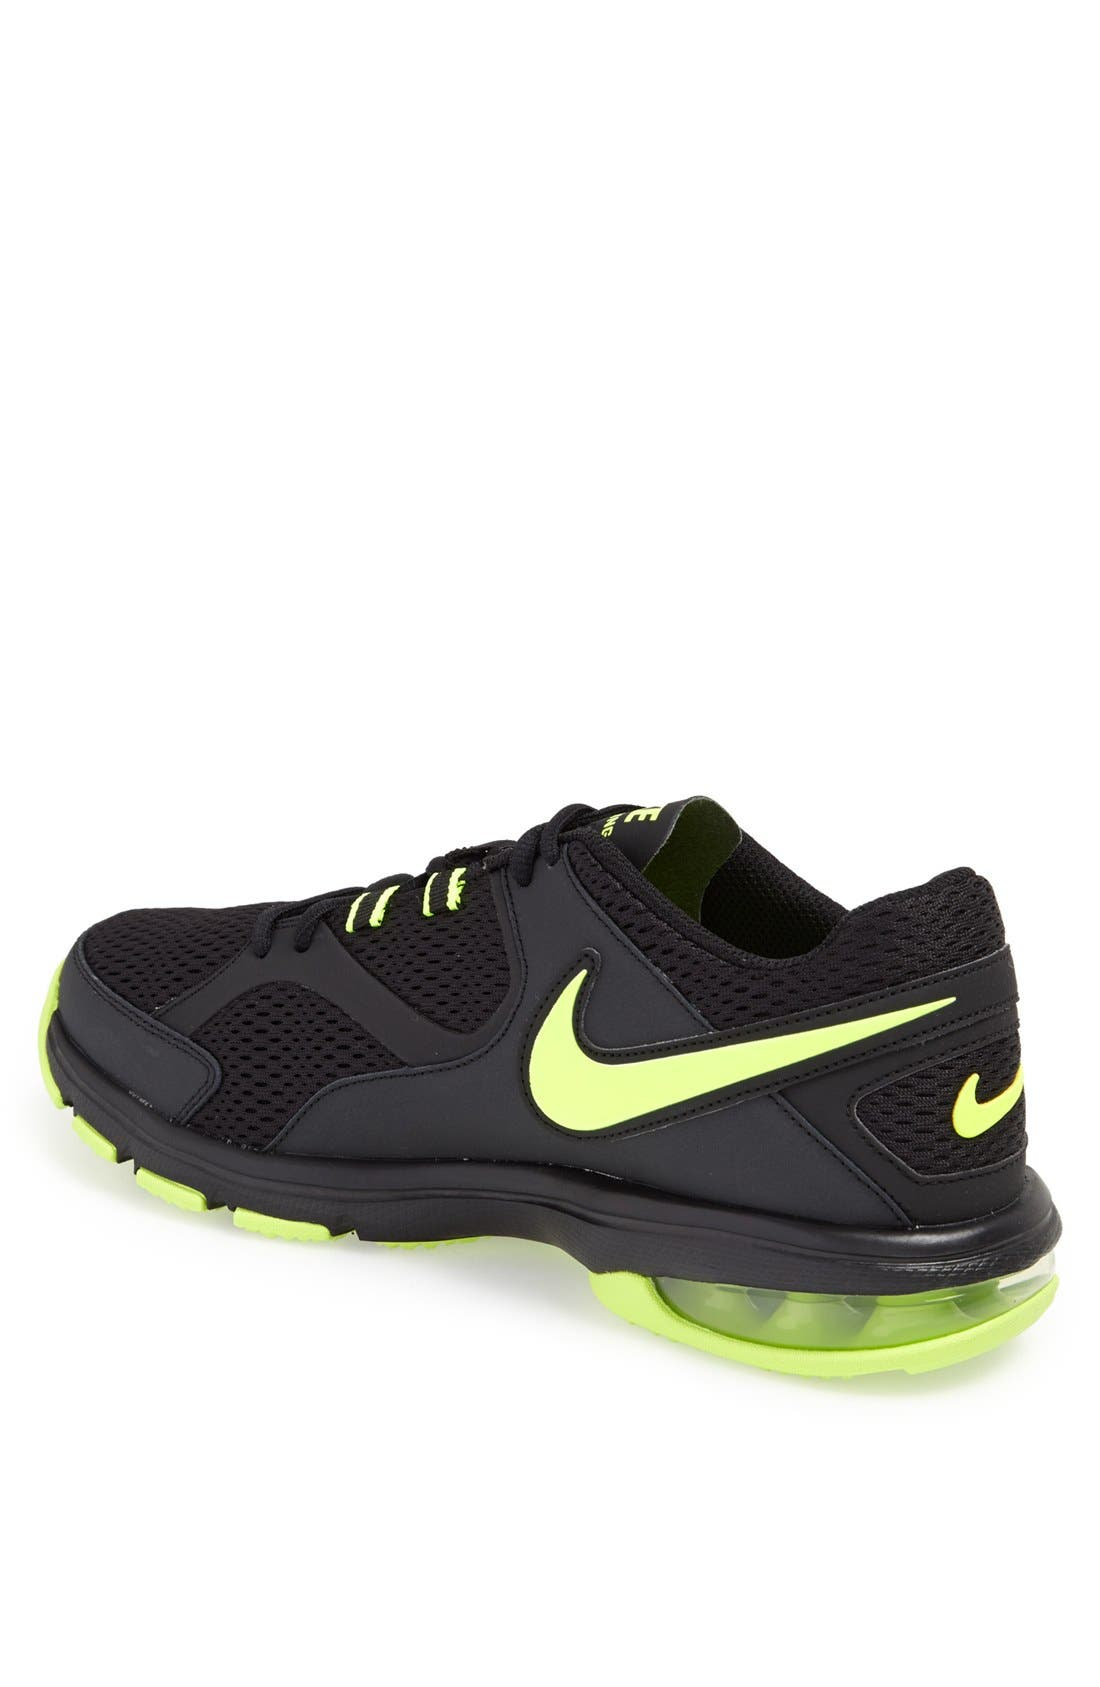 Alternate Image 2  - Nike 'Air Max Compete TR' Training Shoe (Men)